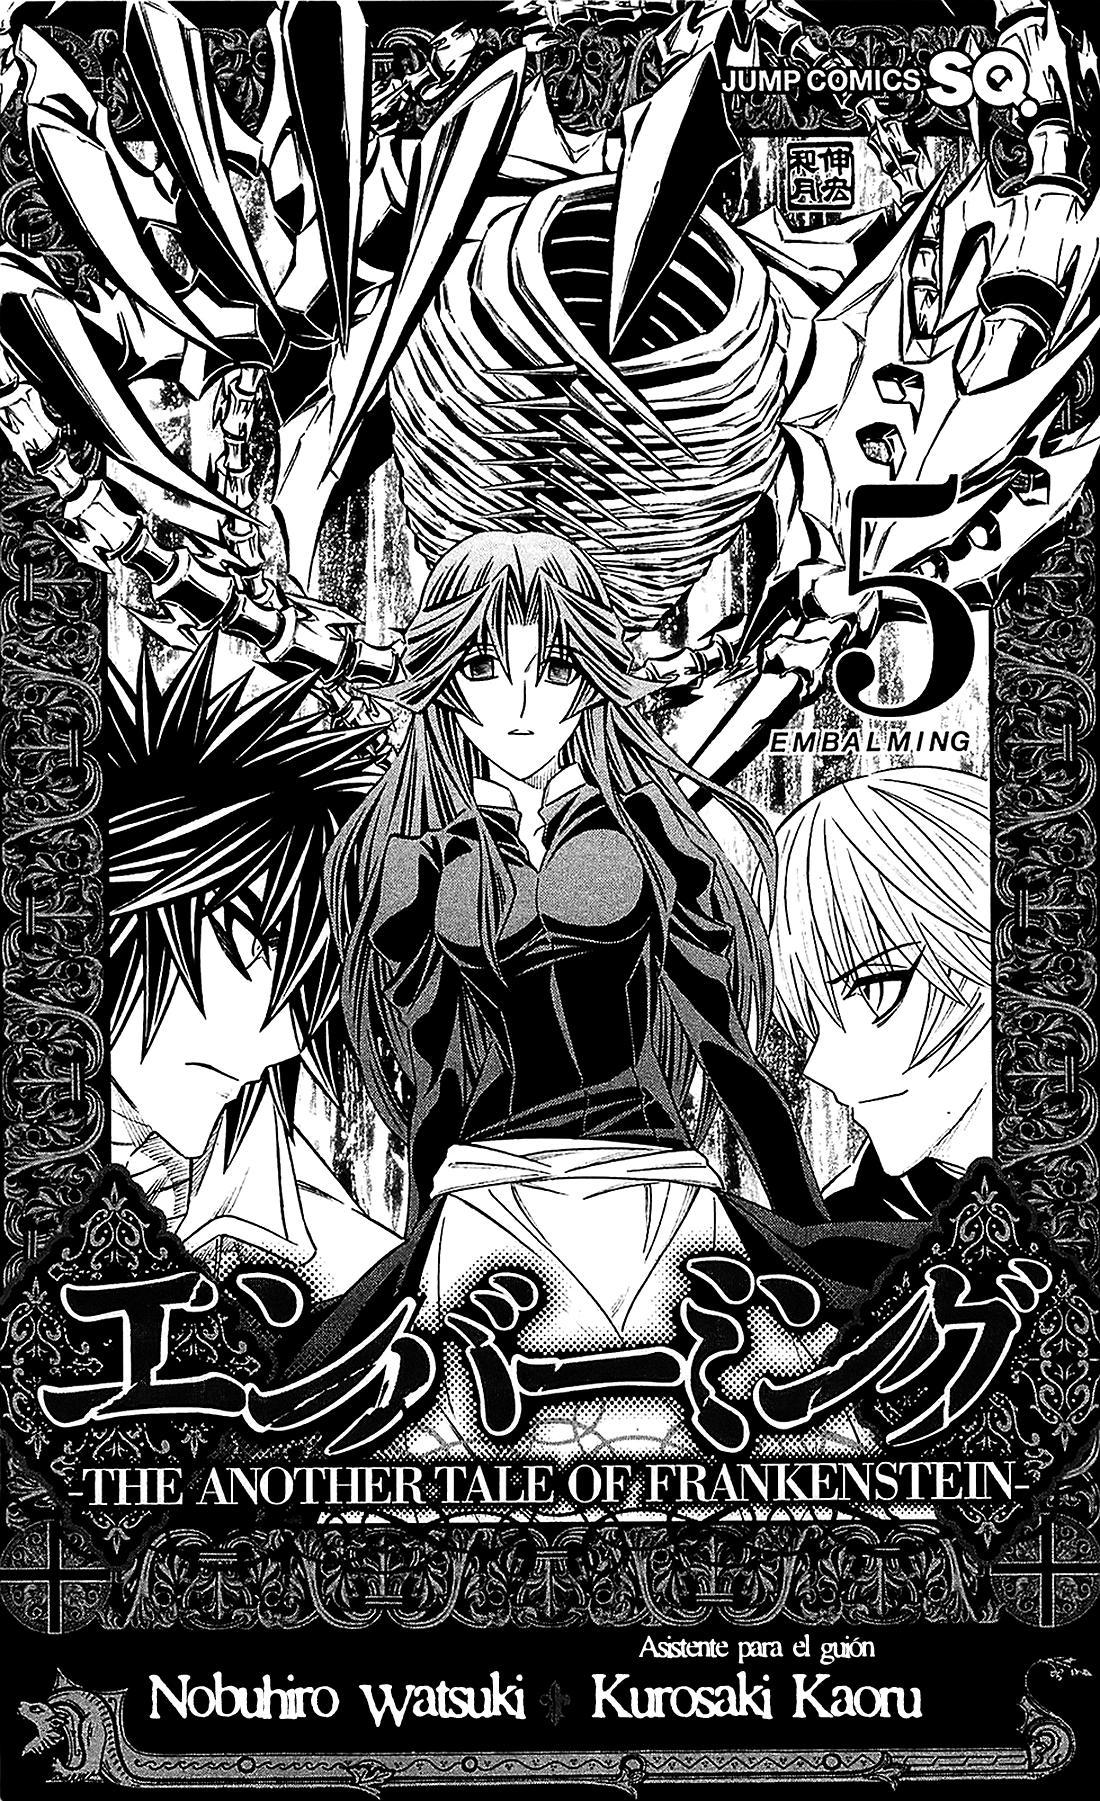 http://c5.ninemanga.com/es_manga/45/18797/447914/646bbc2c112070c26b3c042e81c6947e.jpg Page 7